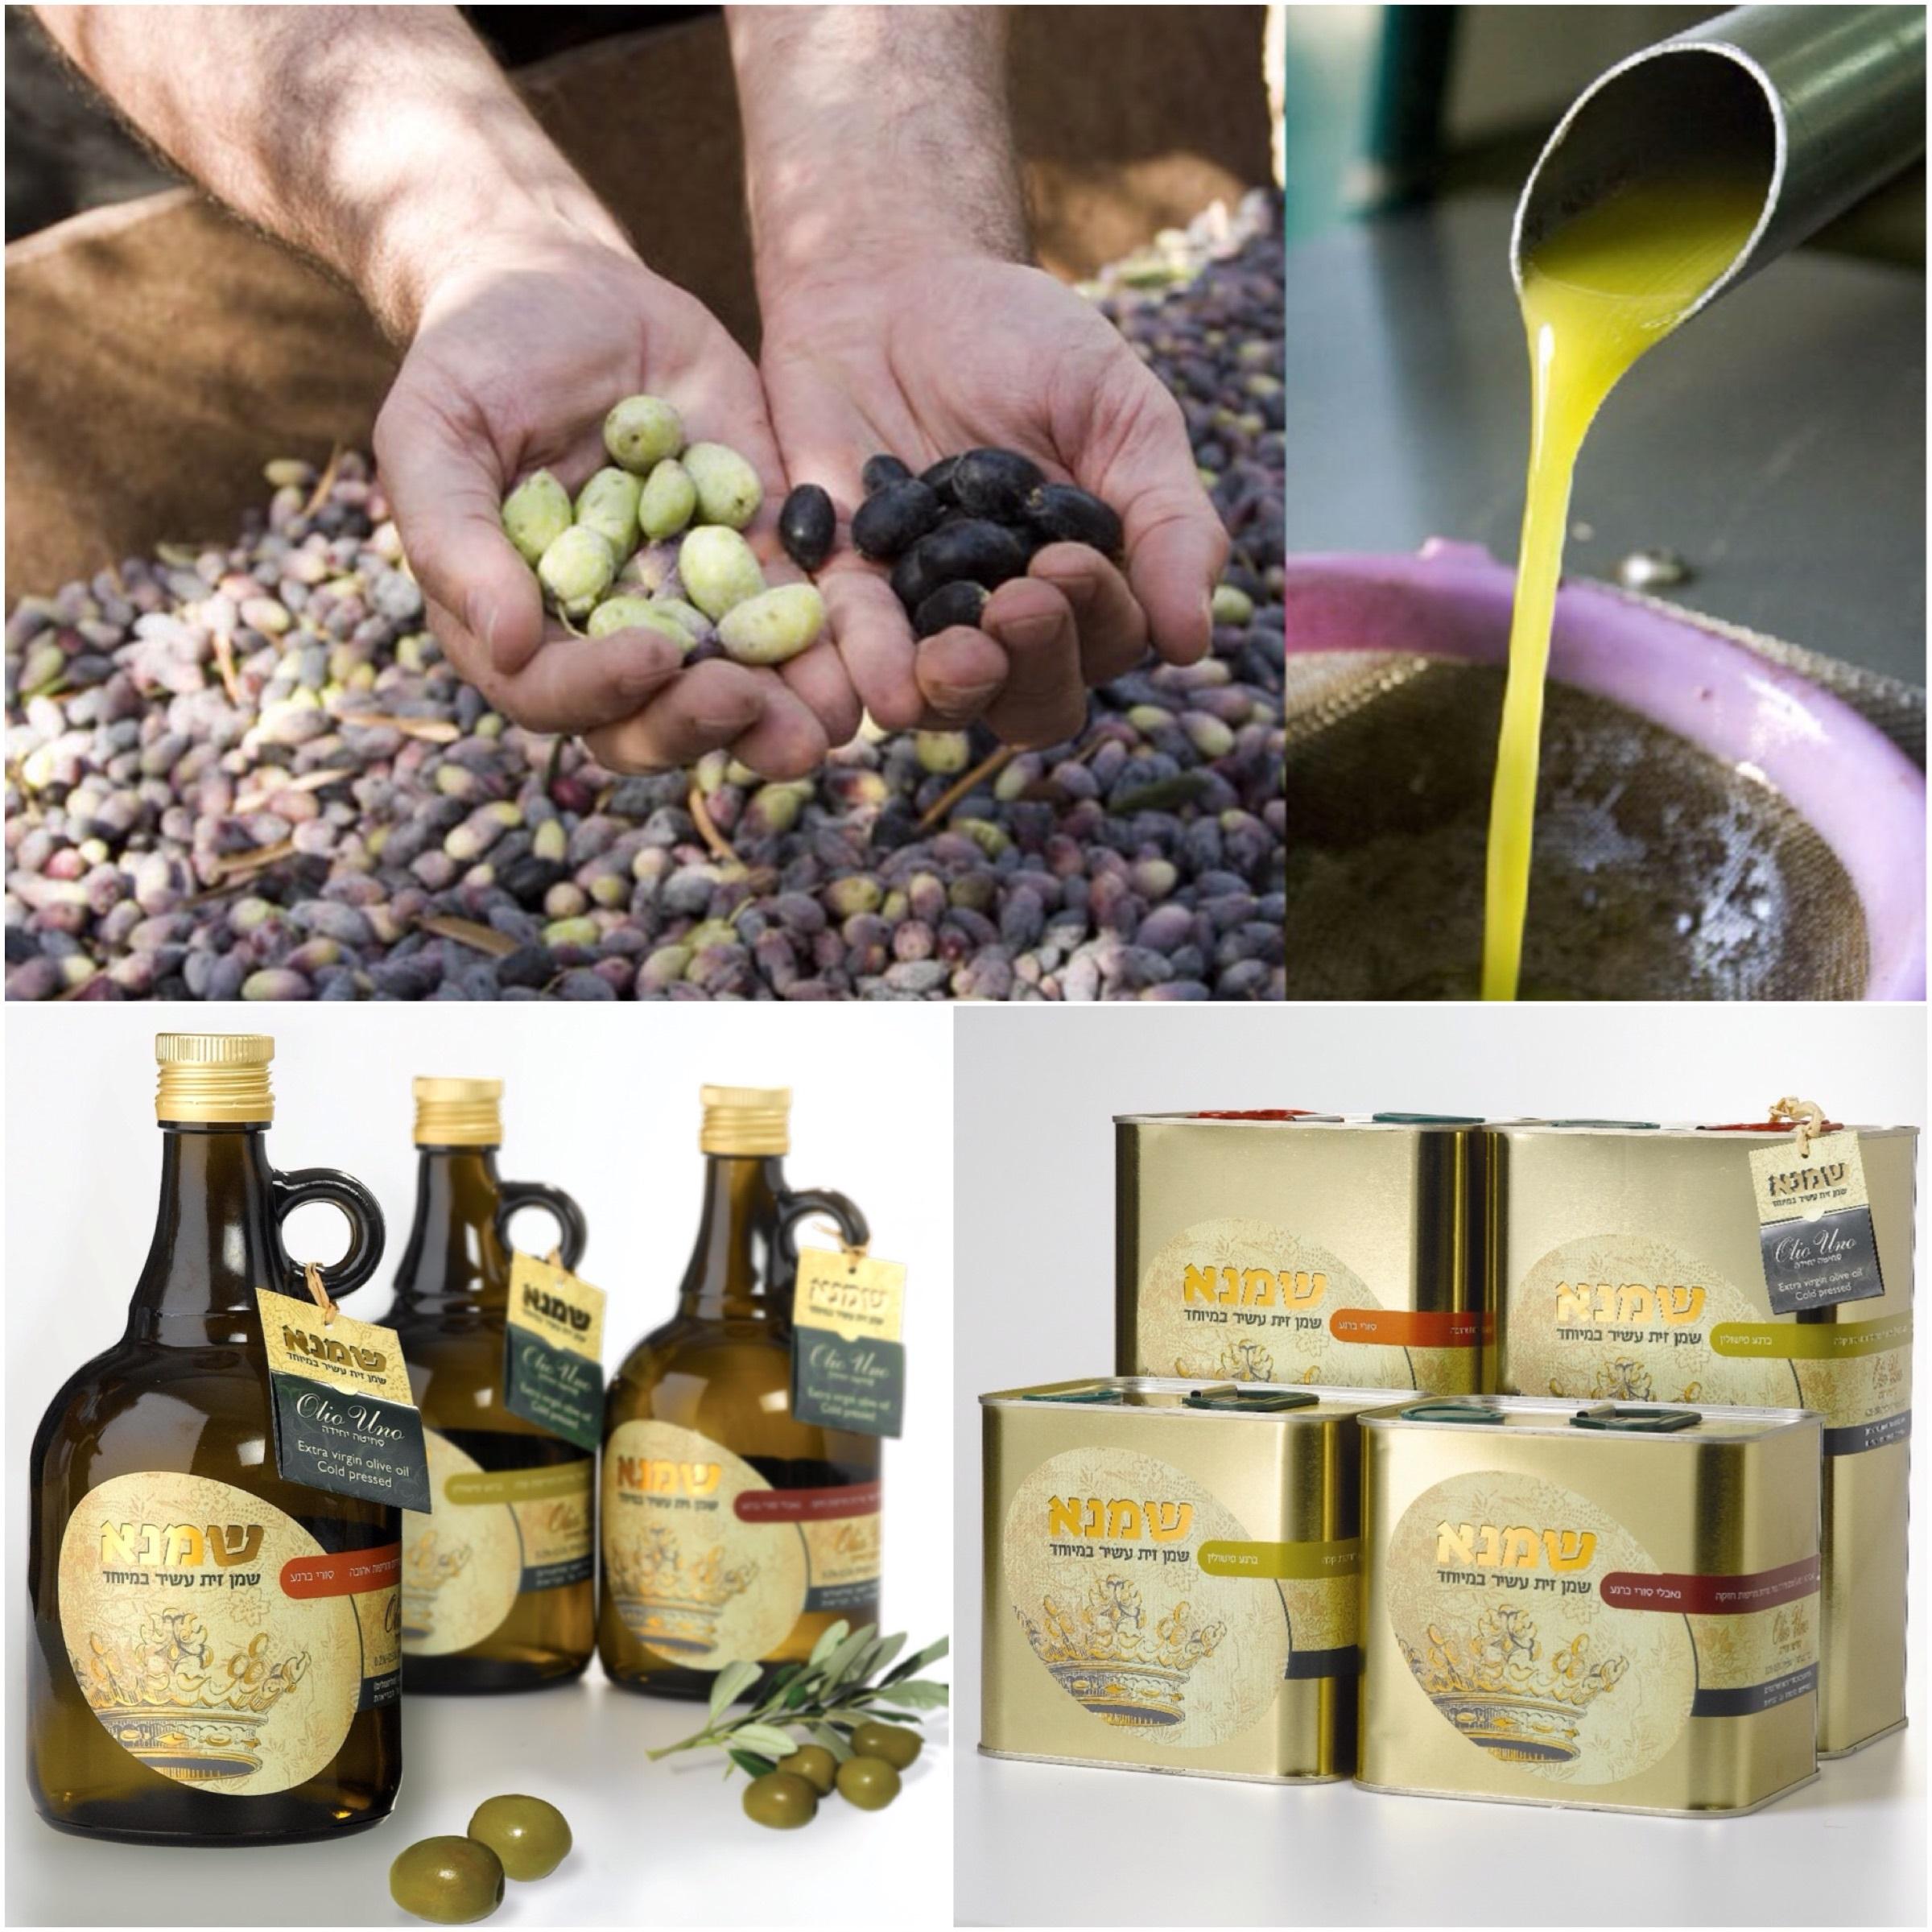 Качество «Шамна»: от момента сбора оливок до приготовления масла – несколько часов